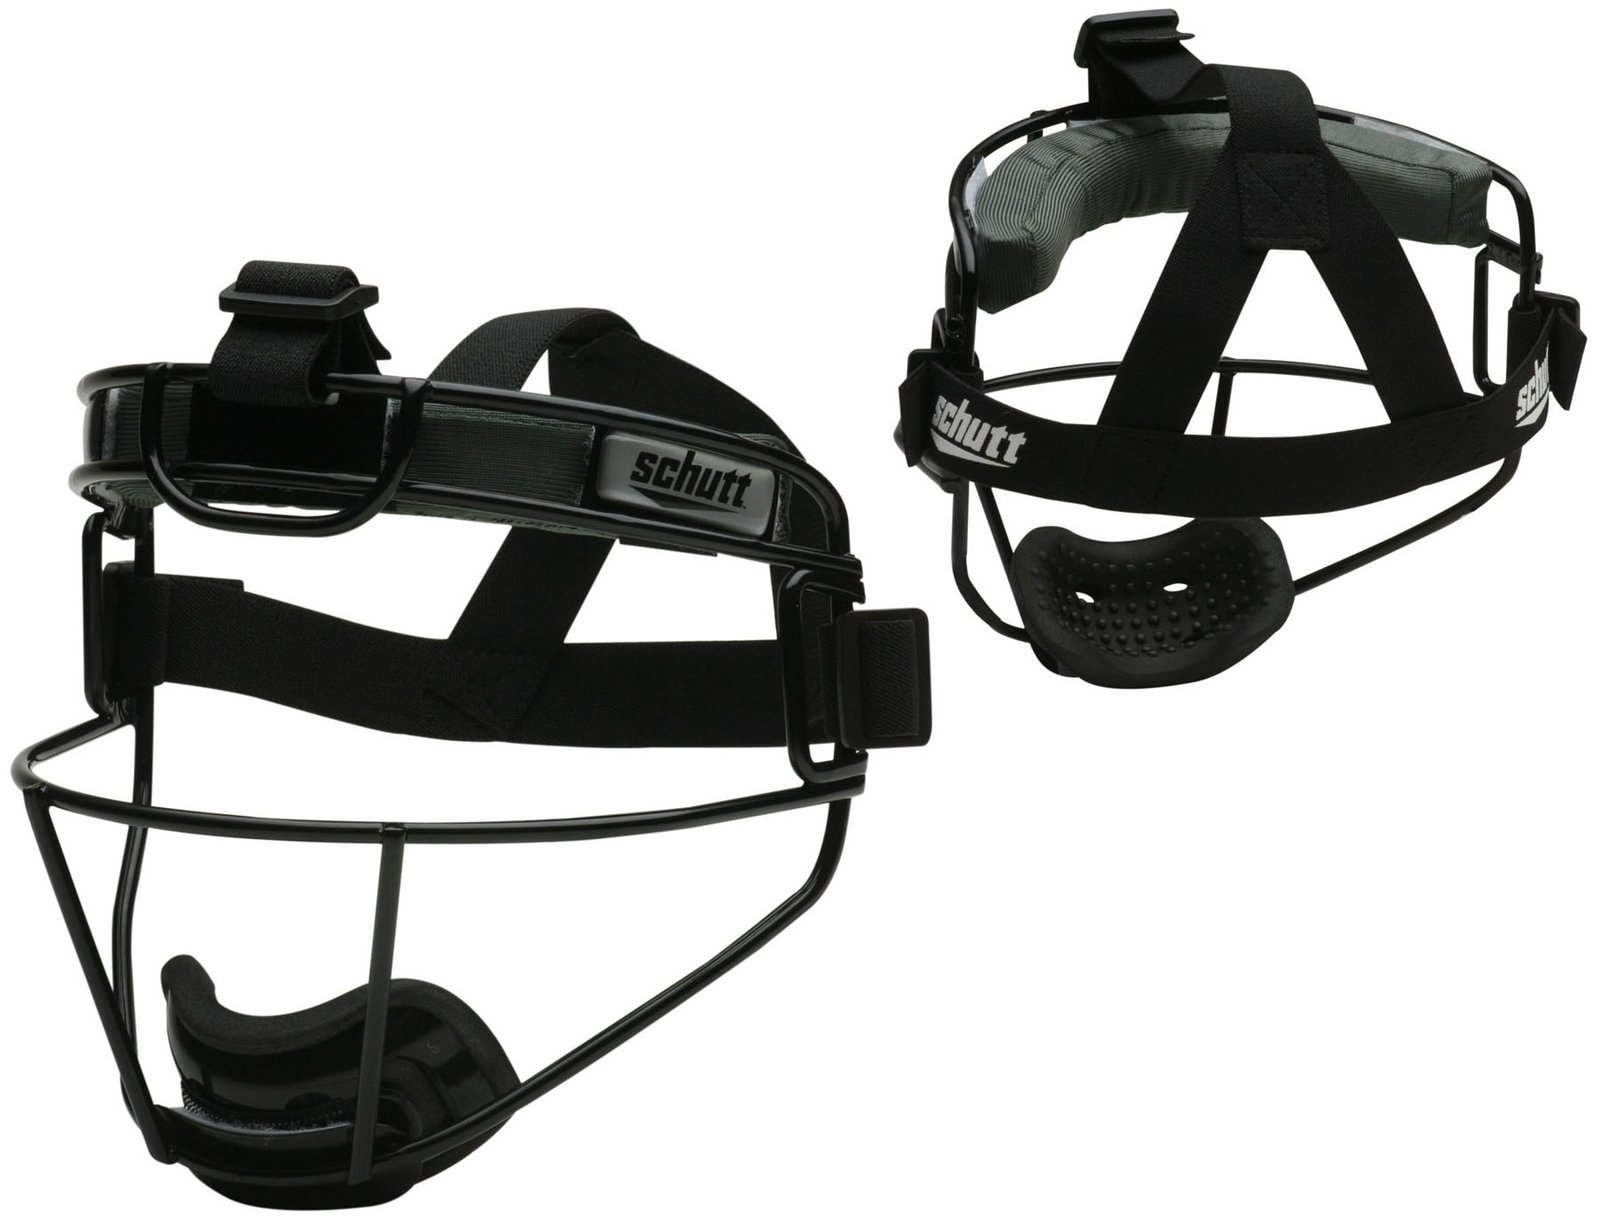 Strict Rip-it Custom Padding For Fielders Mask Batting Helmets & Face Guards